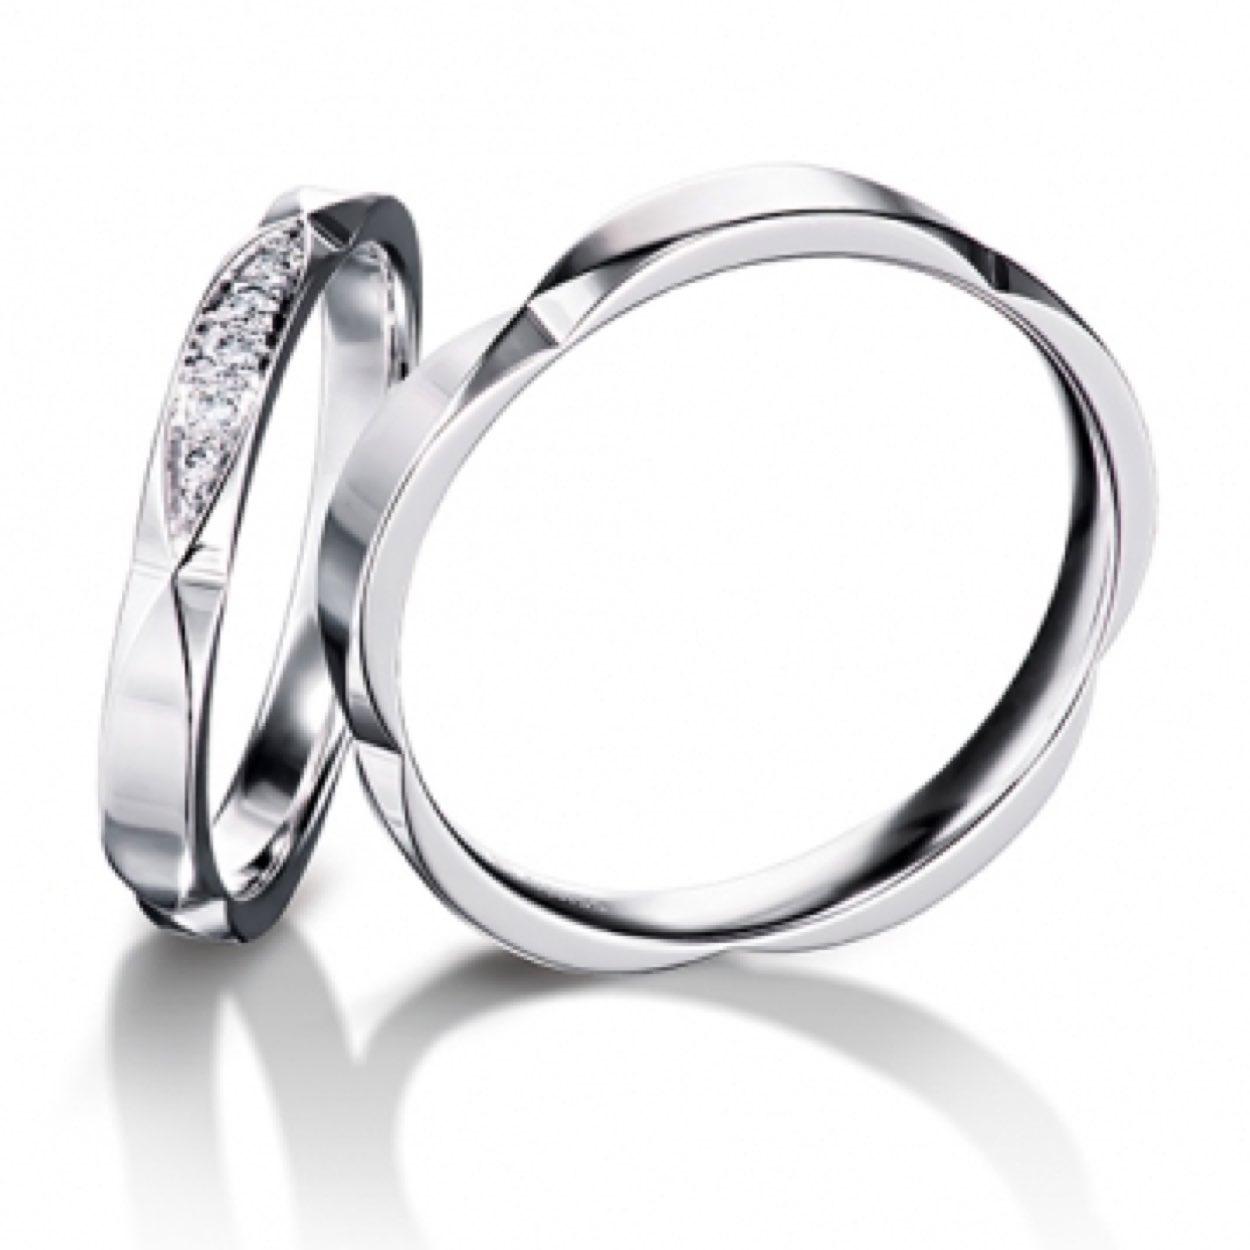 〈結婚指輪〉Sakura